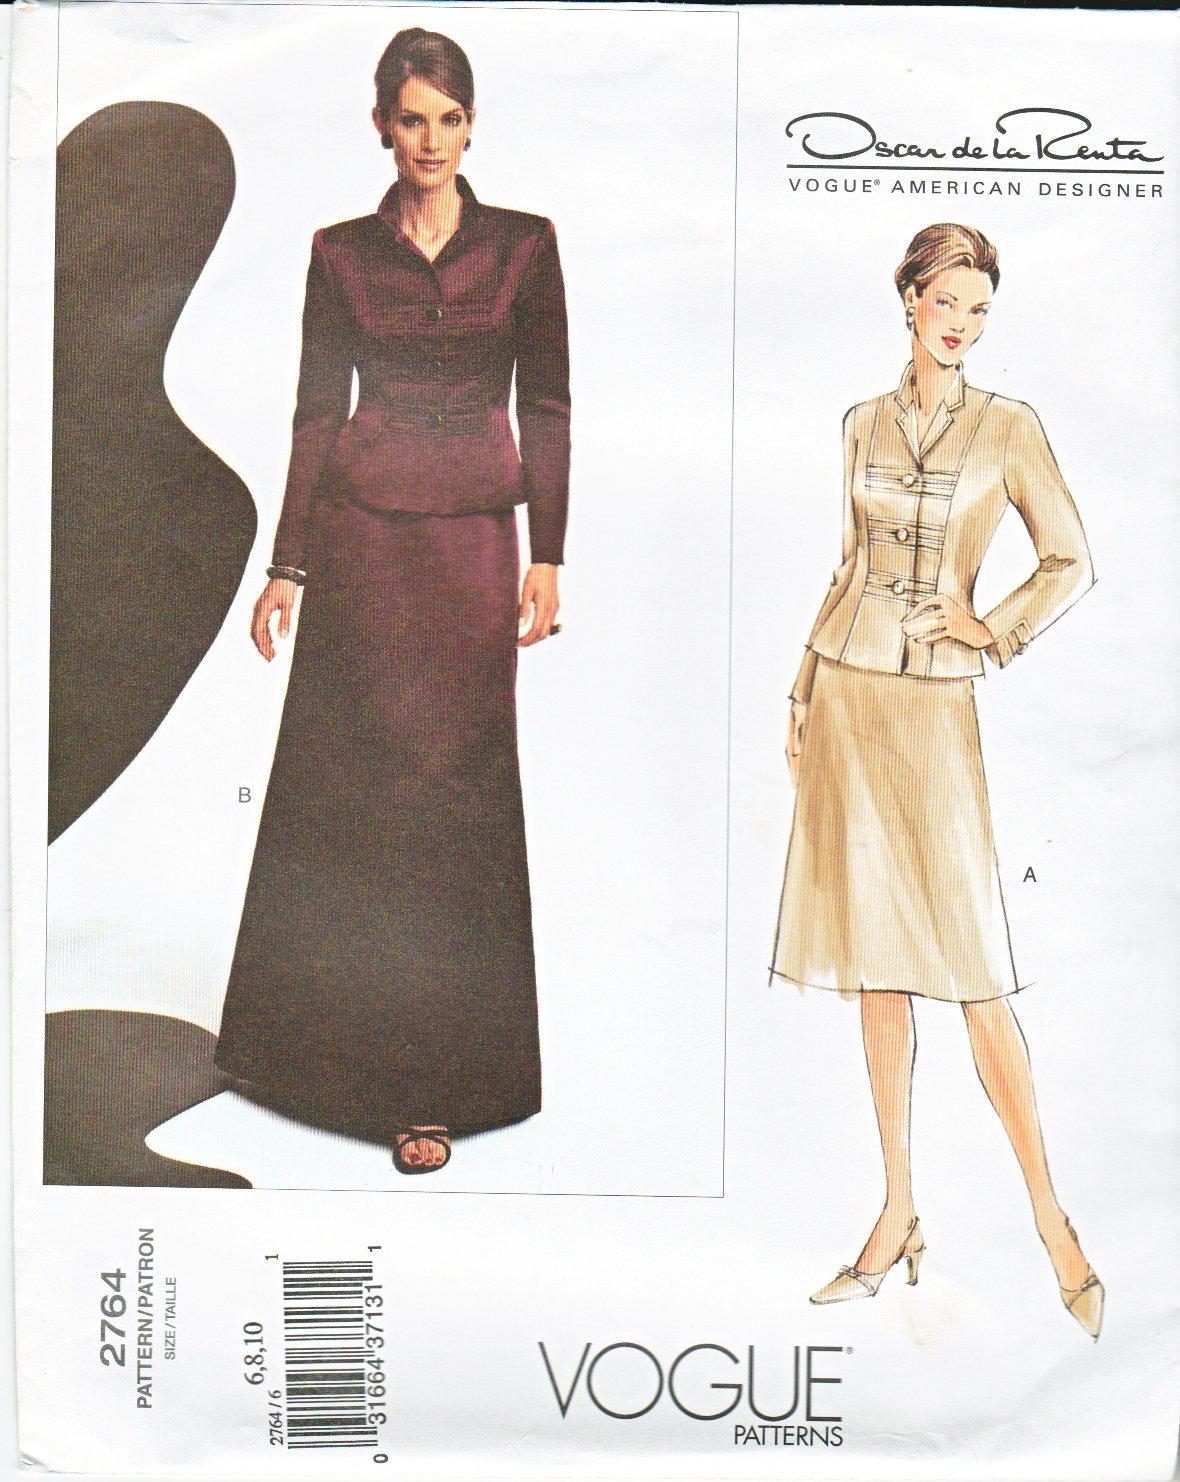 Vogue Sewing Pattern 2764 Misses size 12-14-16 Oscar de la Renta Jacket Skirt